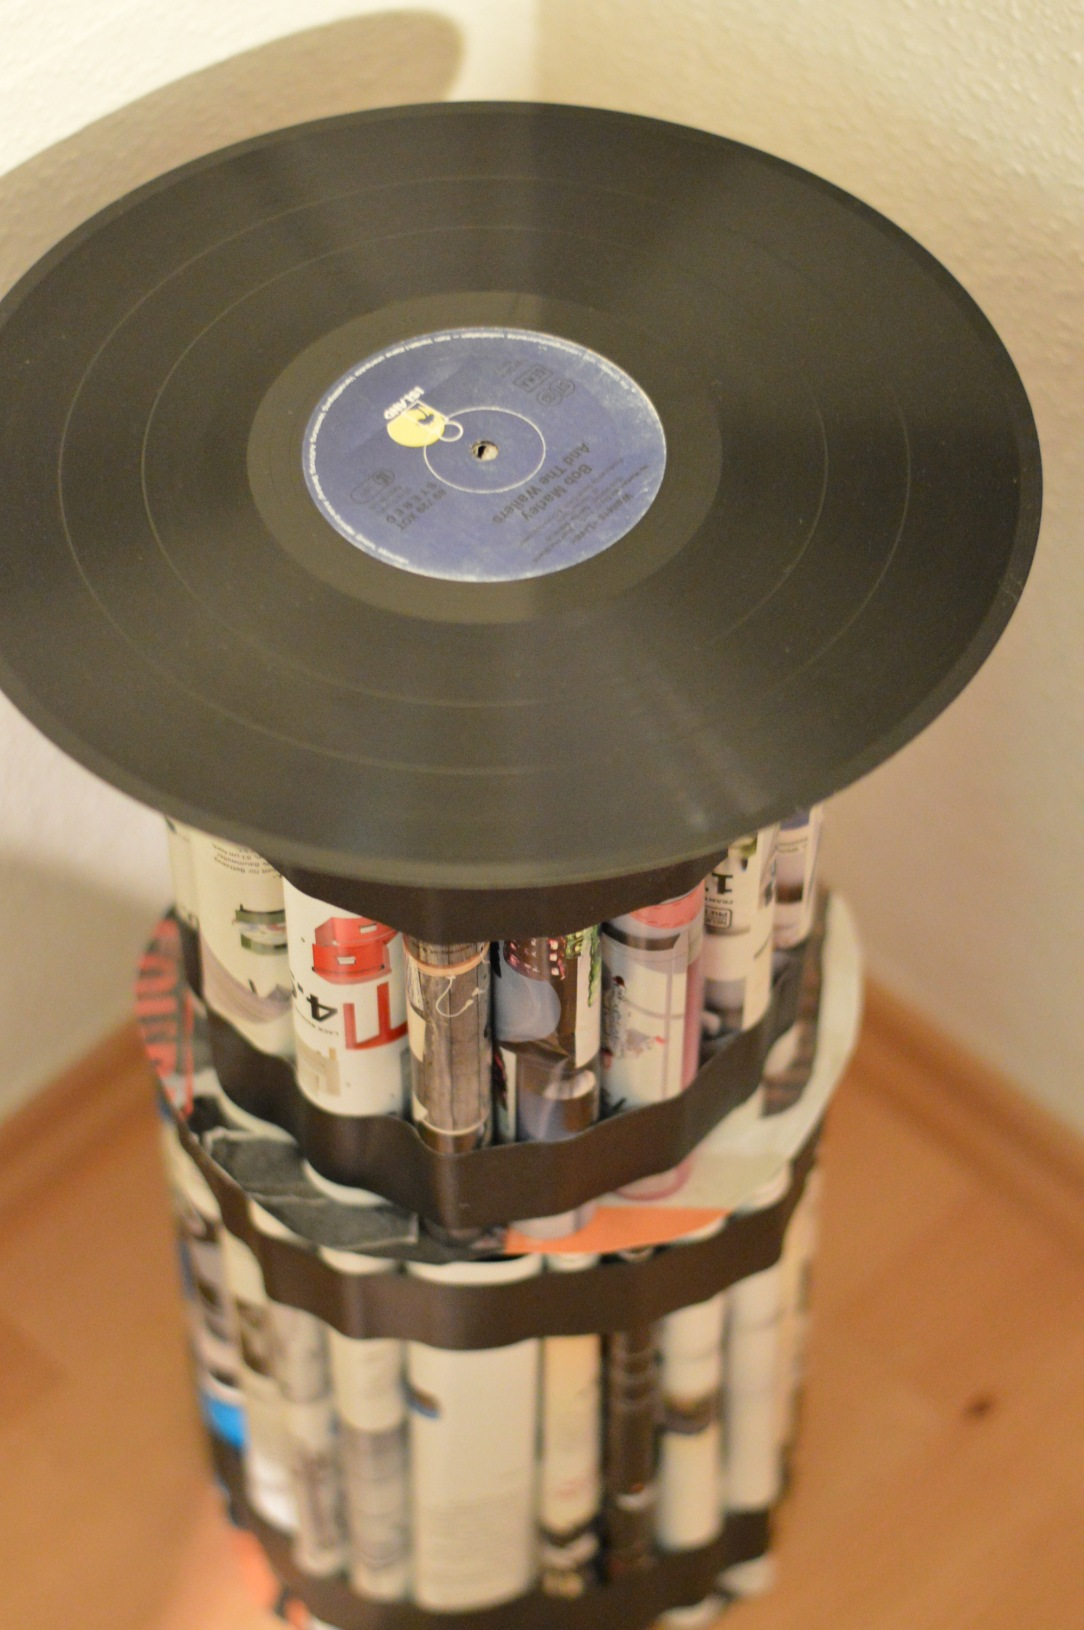 Upcycling Table Tisch Magazine Record Schallplatte